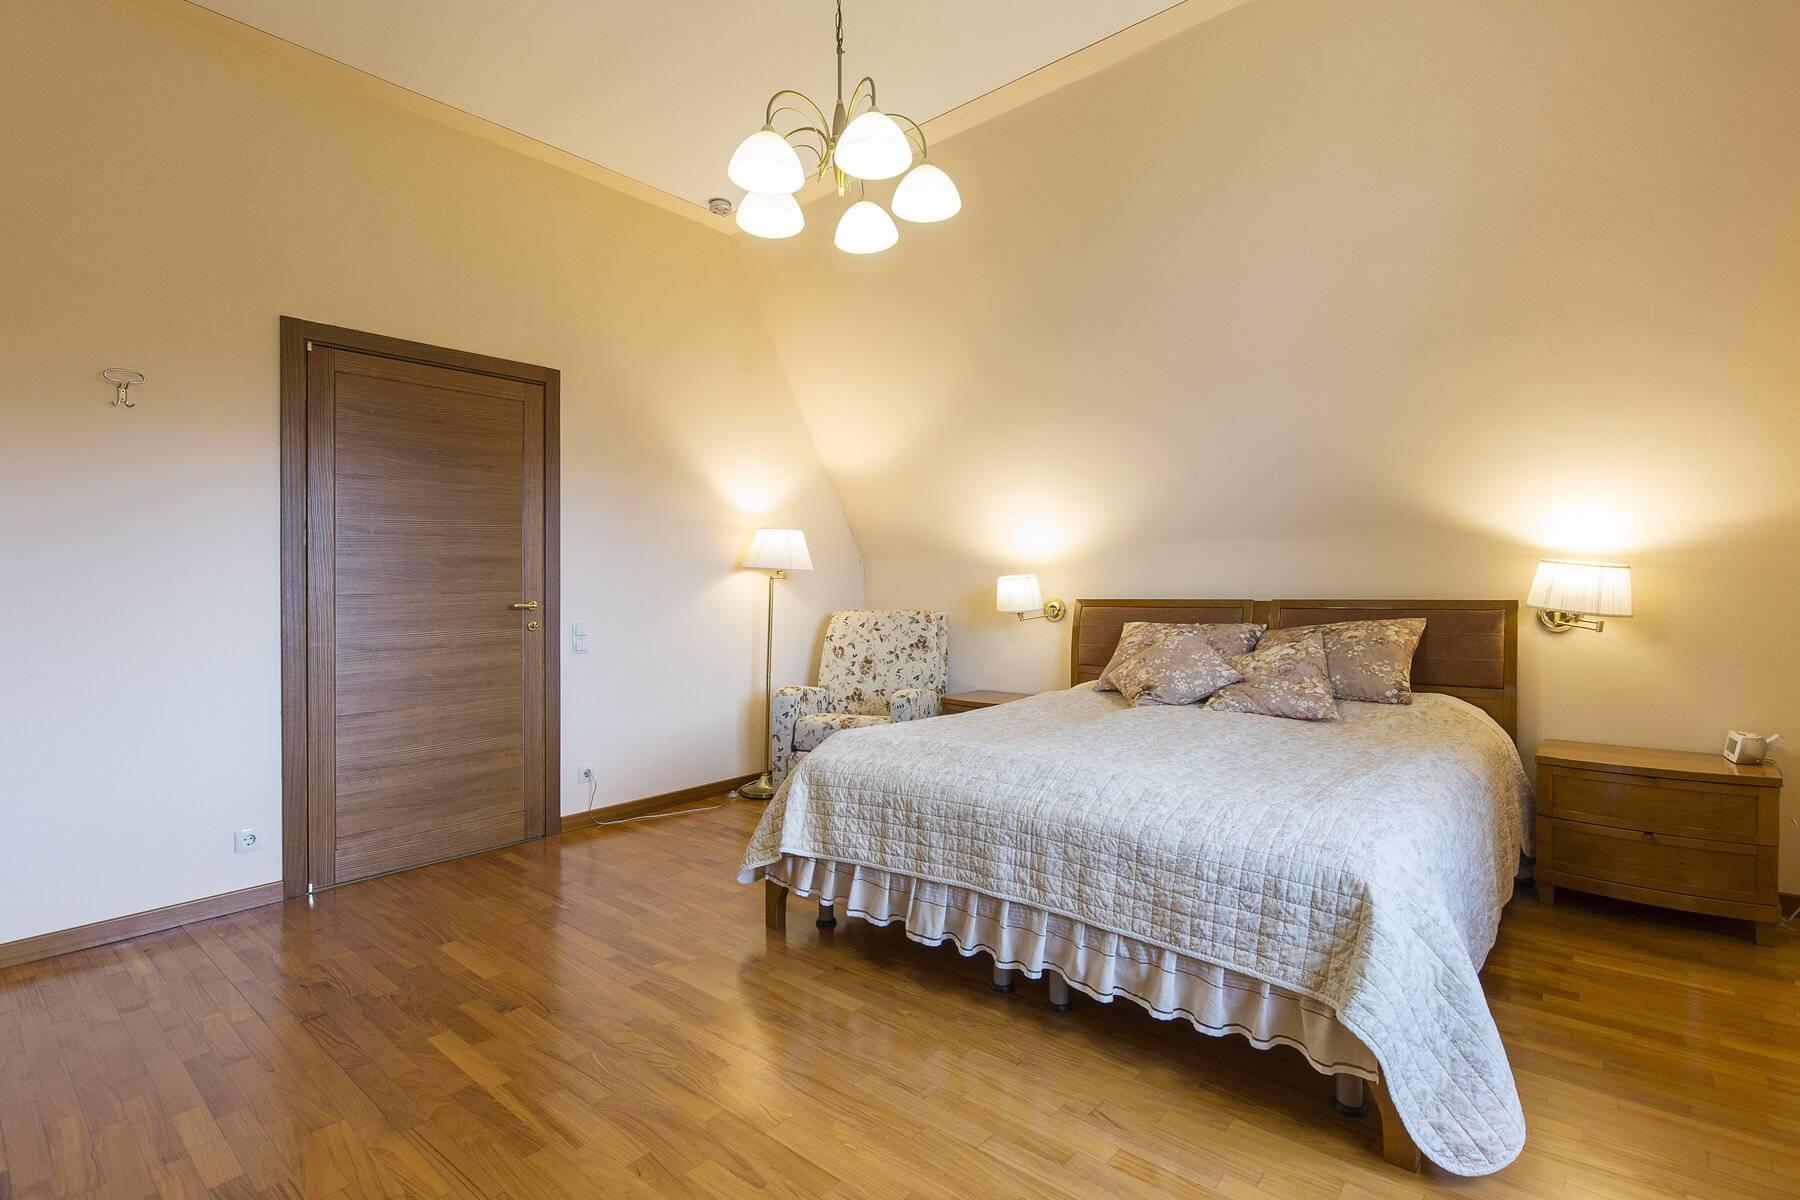 Villa in Vendita a Stresa: 5 locali, 364 mq - Foto 22